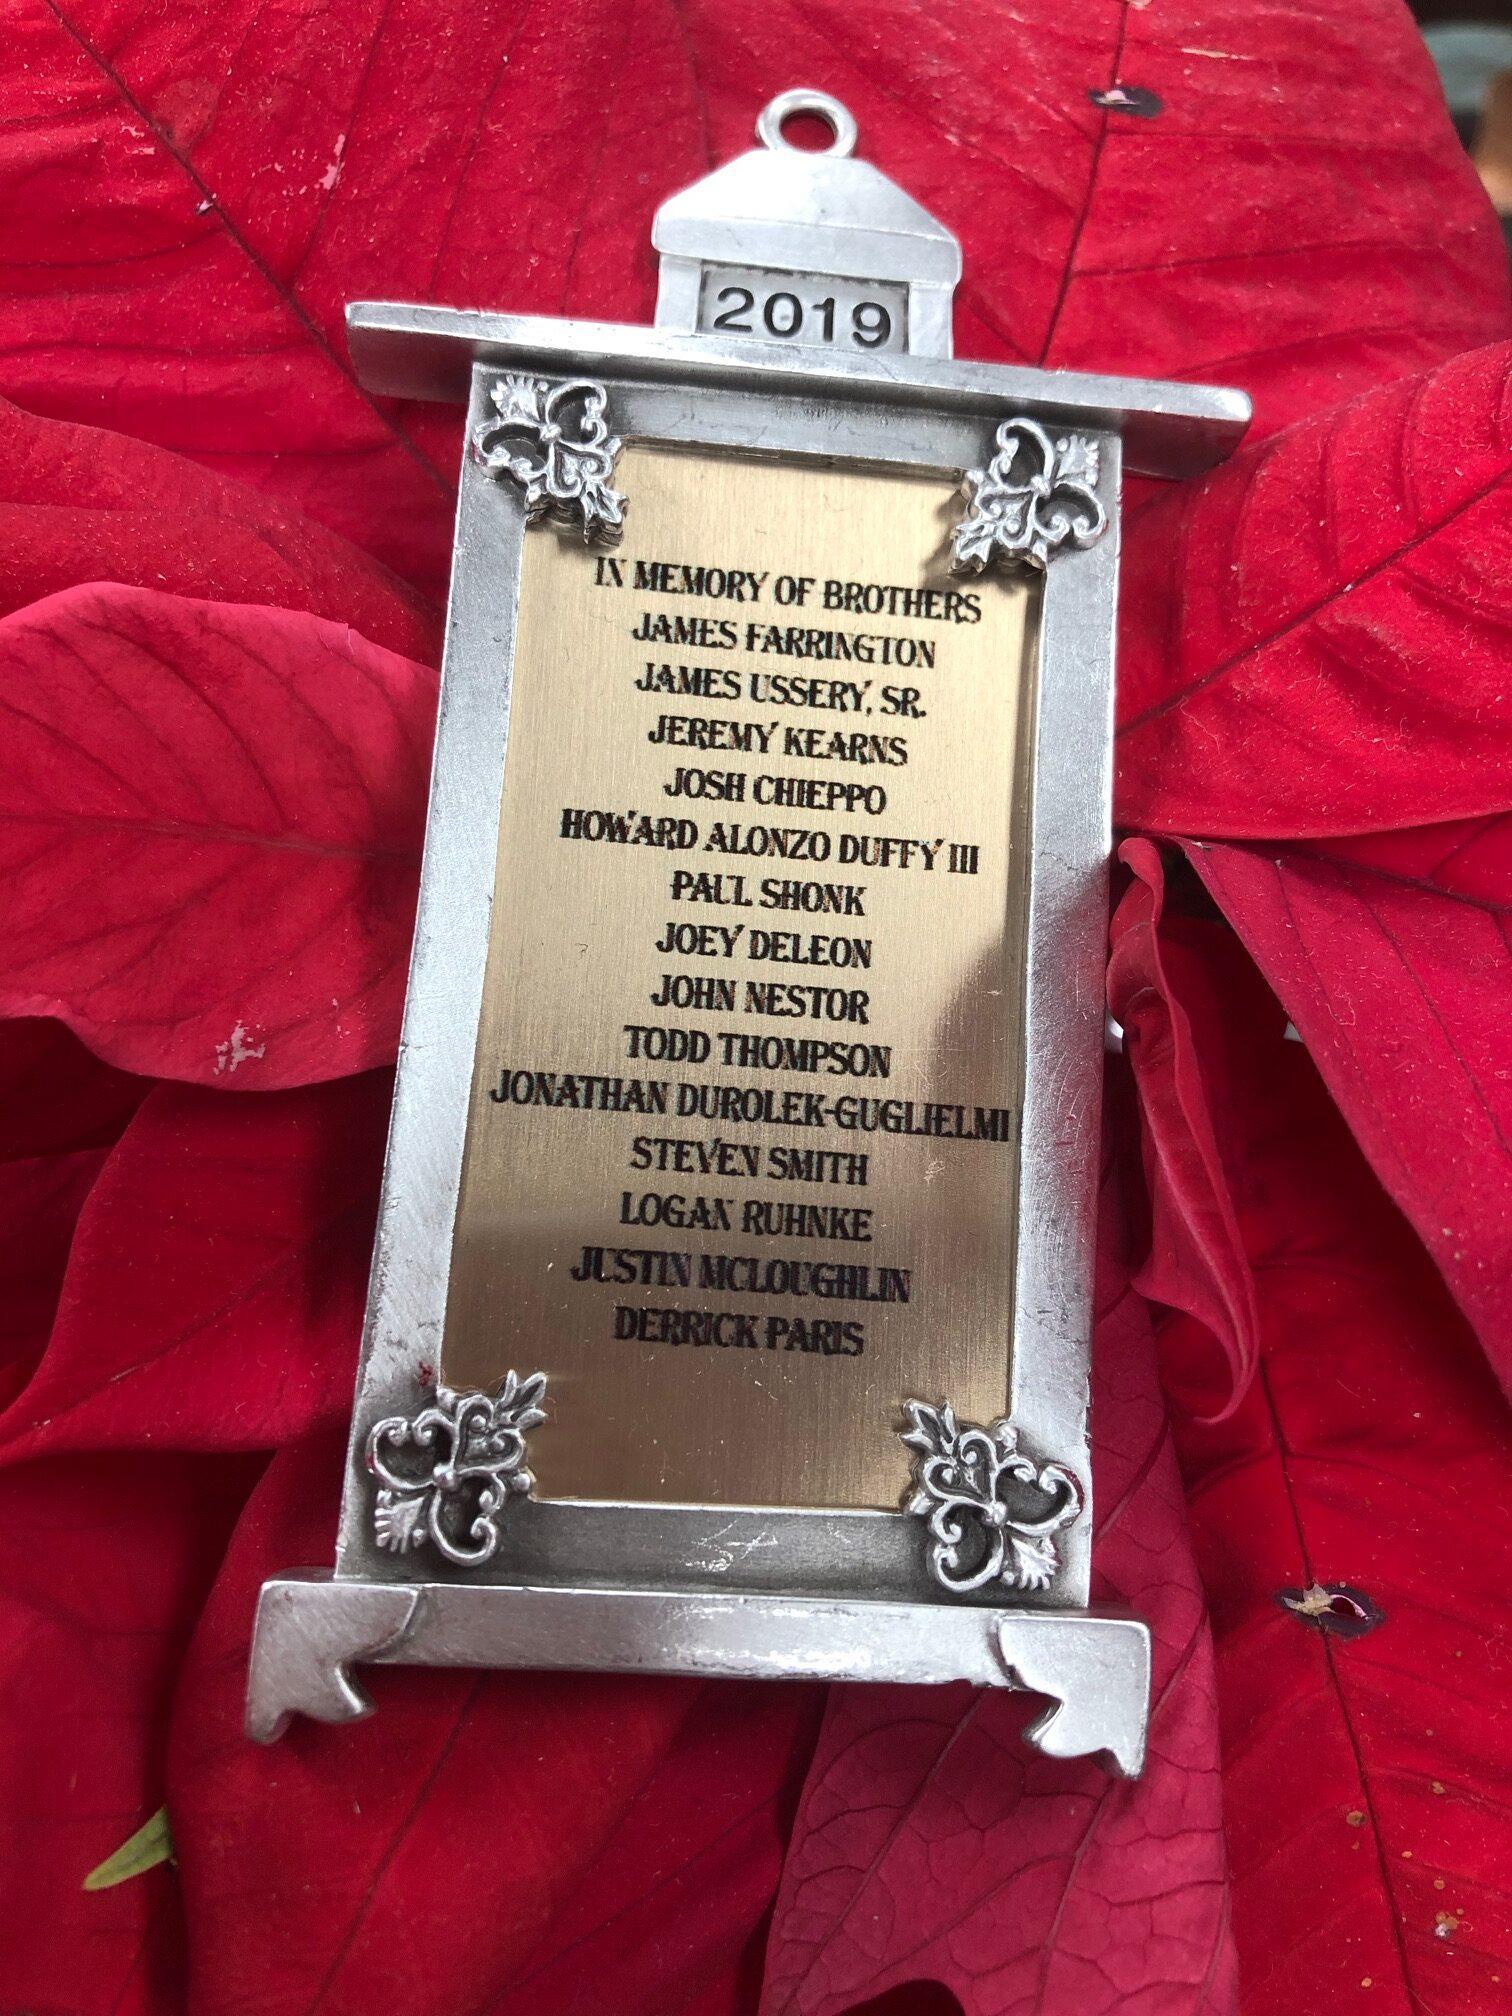 2019 Commemorative Fallen Linemen Ornament